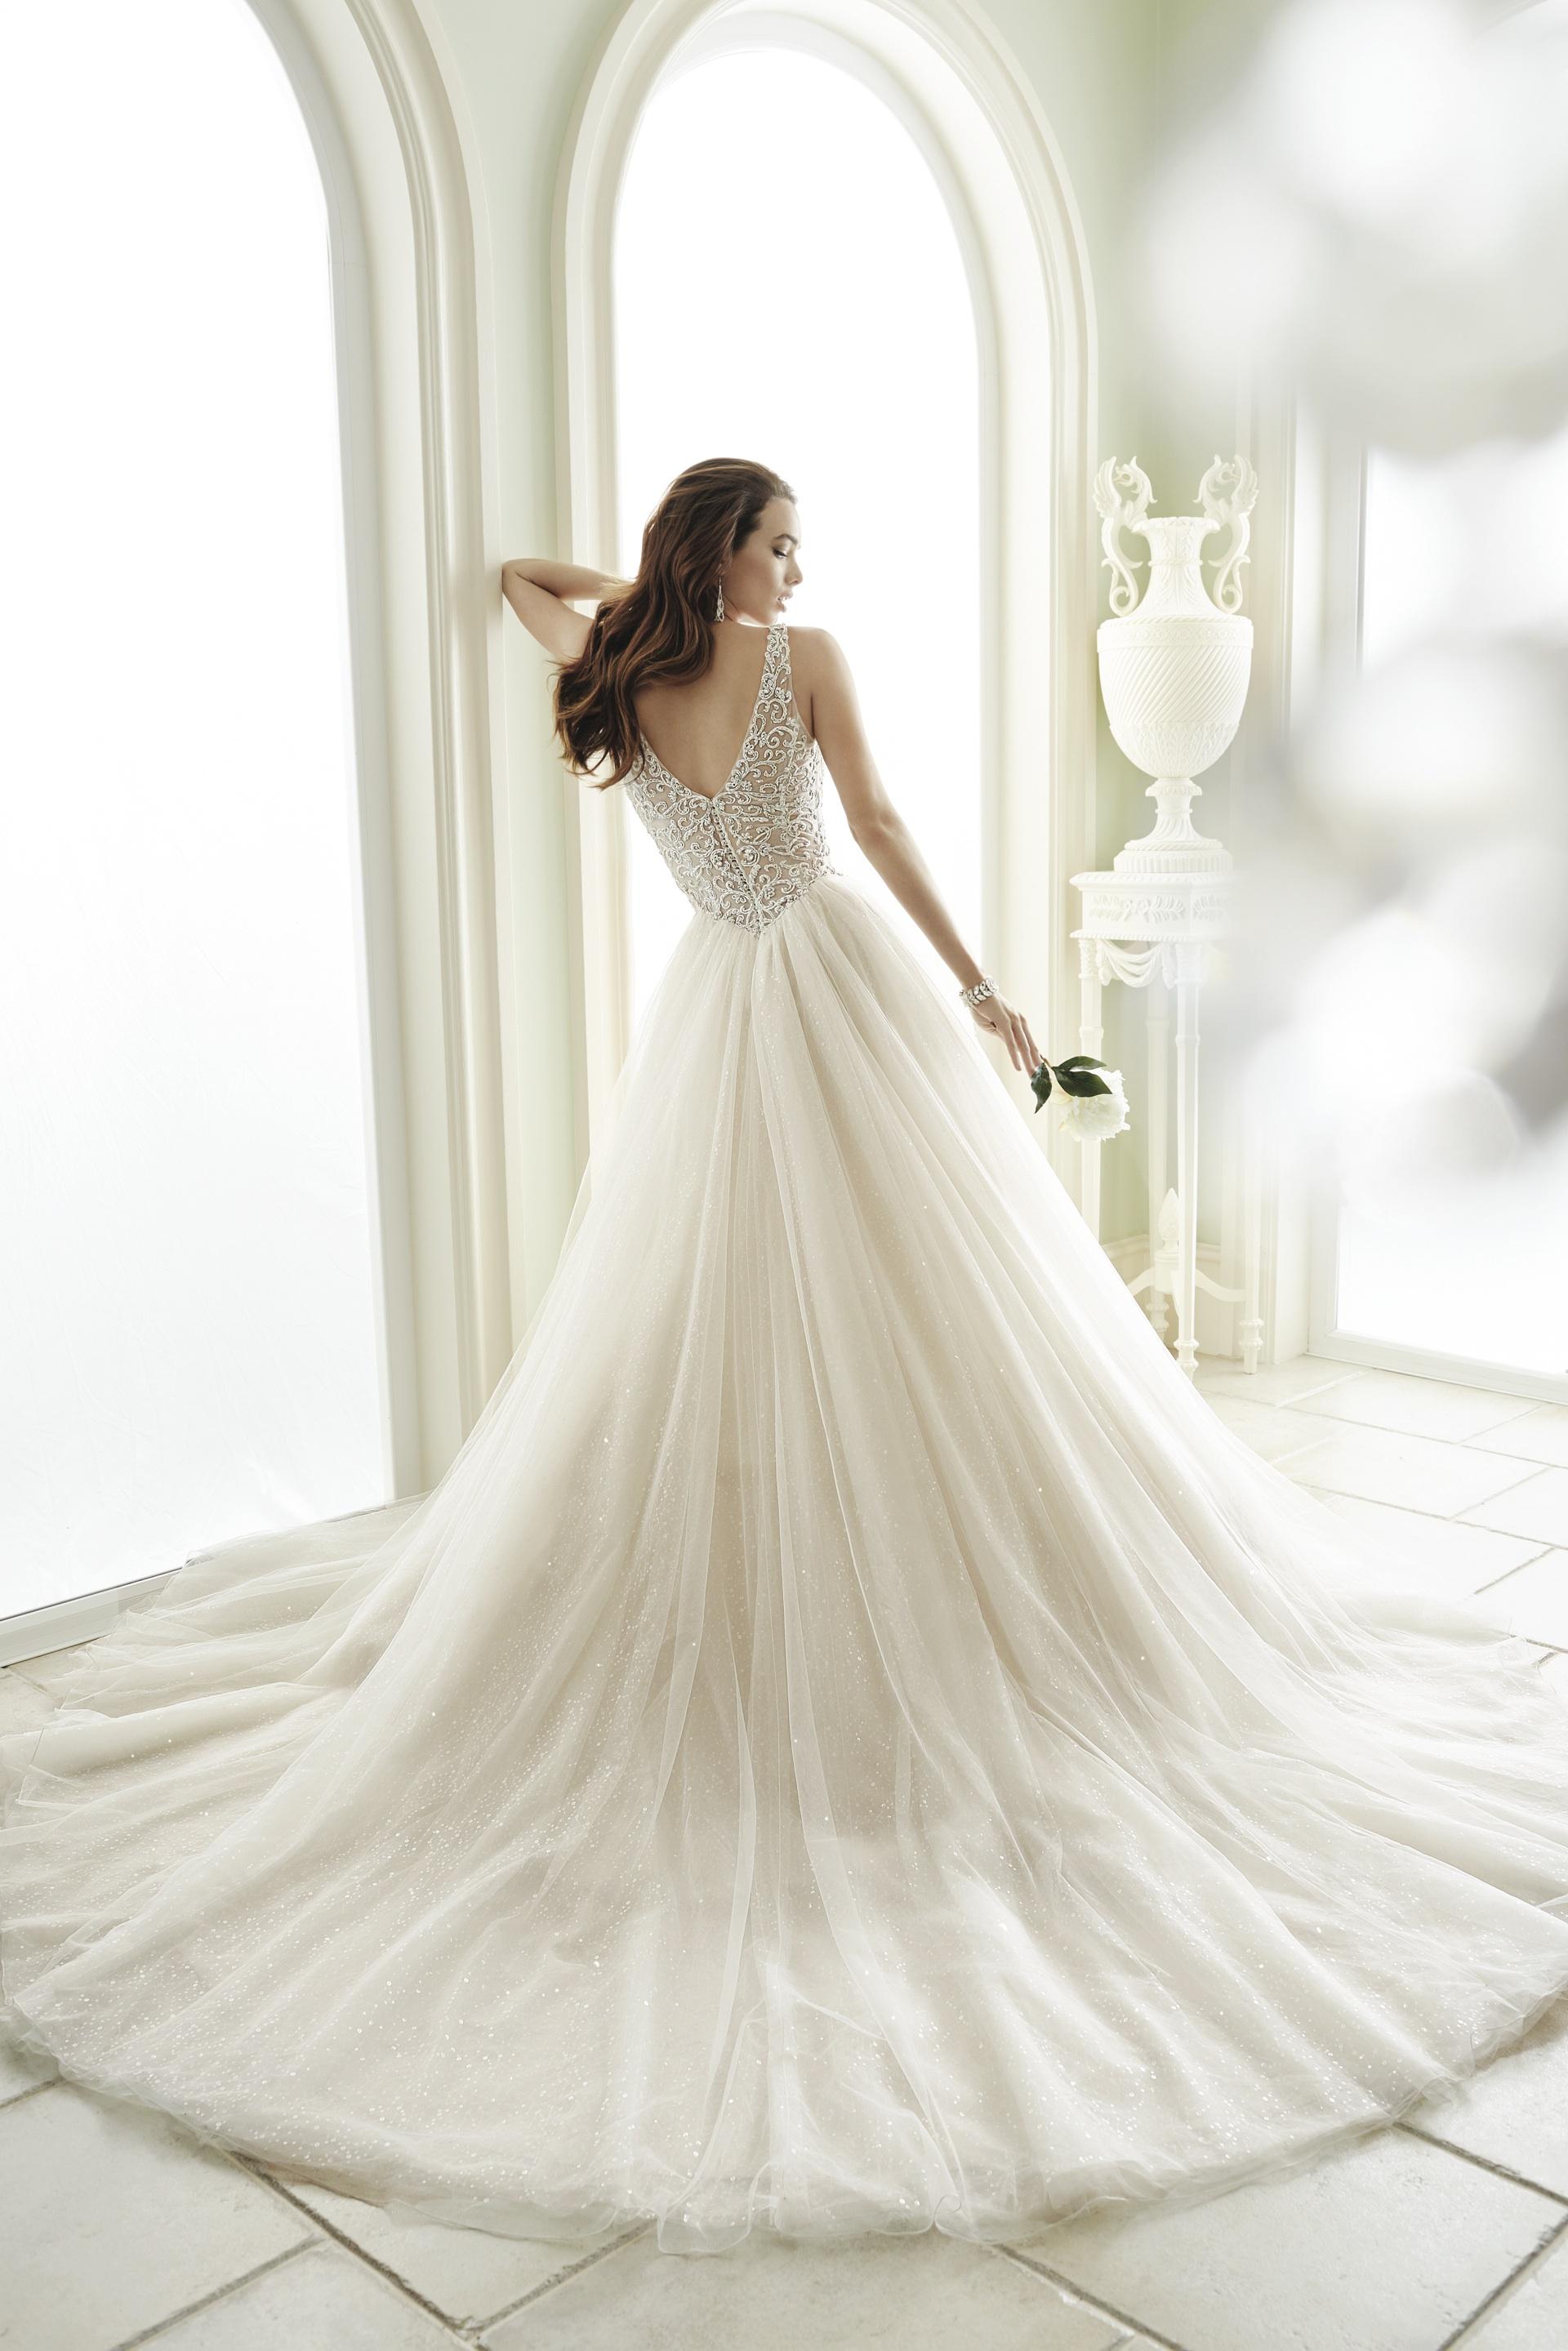 Wedding Dress For   Southampton : Wedding dresses southampton hampshire